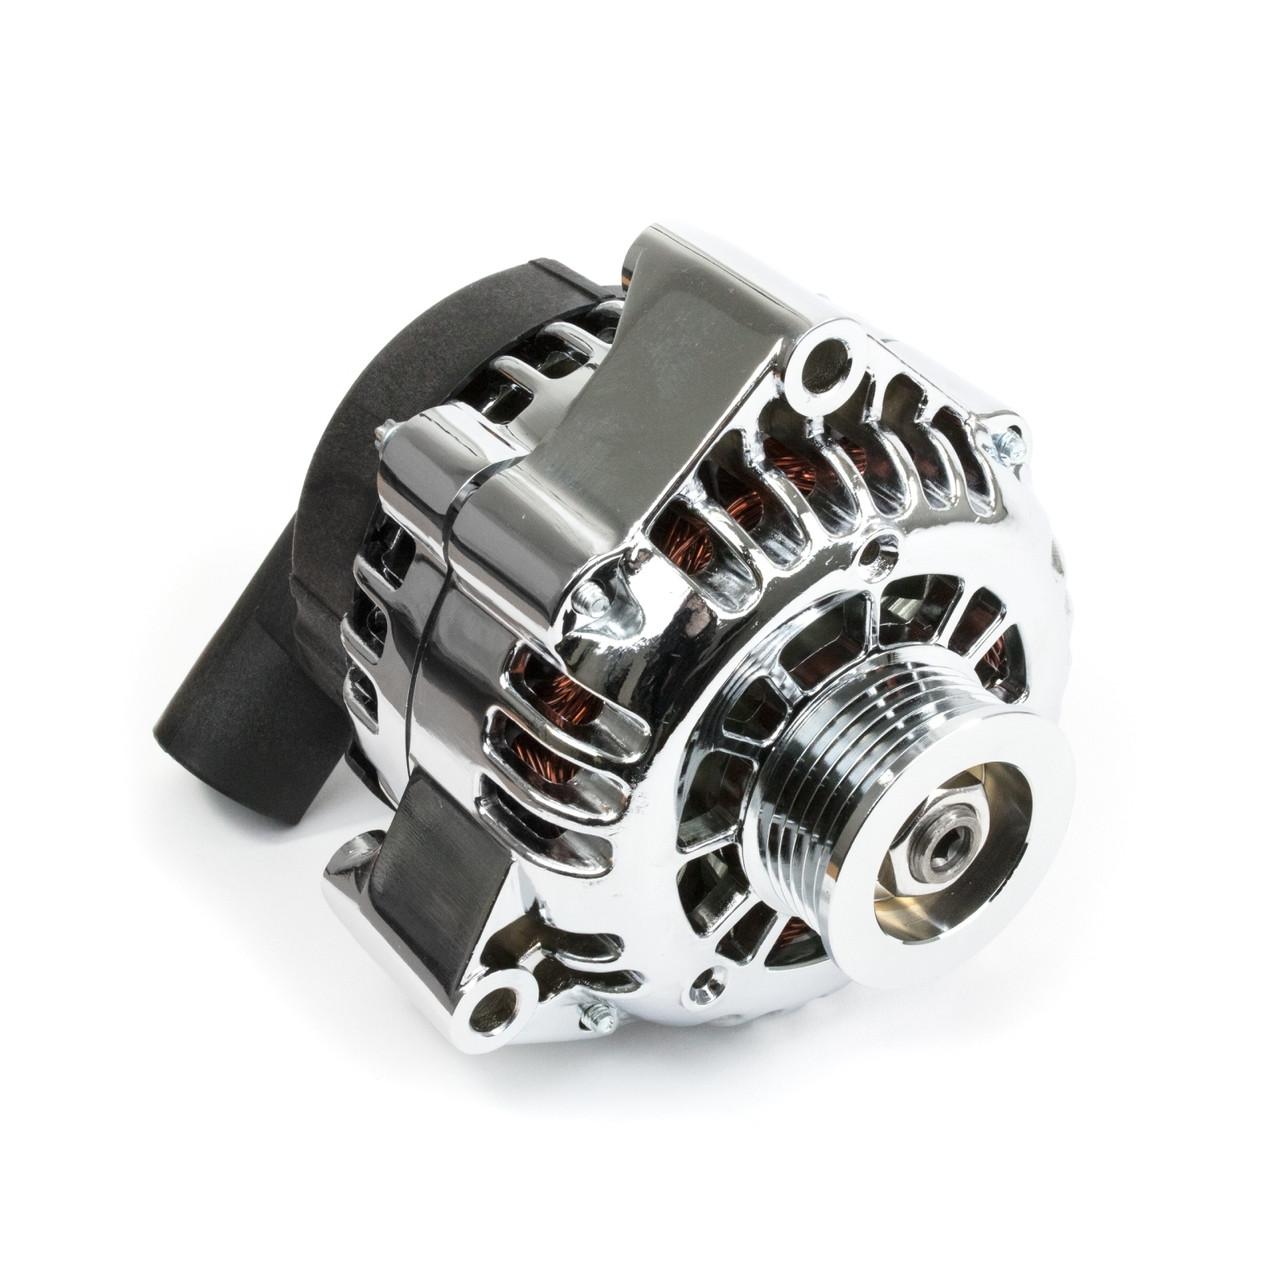 gm ls car cs130d style high output 180 amp chrome alternator rh lsxceleration com GM CS130 Alternator Wiring GM CS130 Alternator Wiring